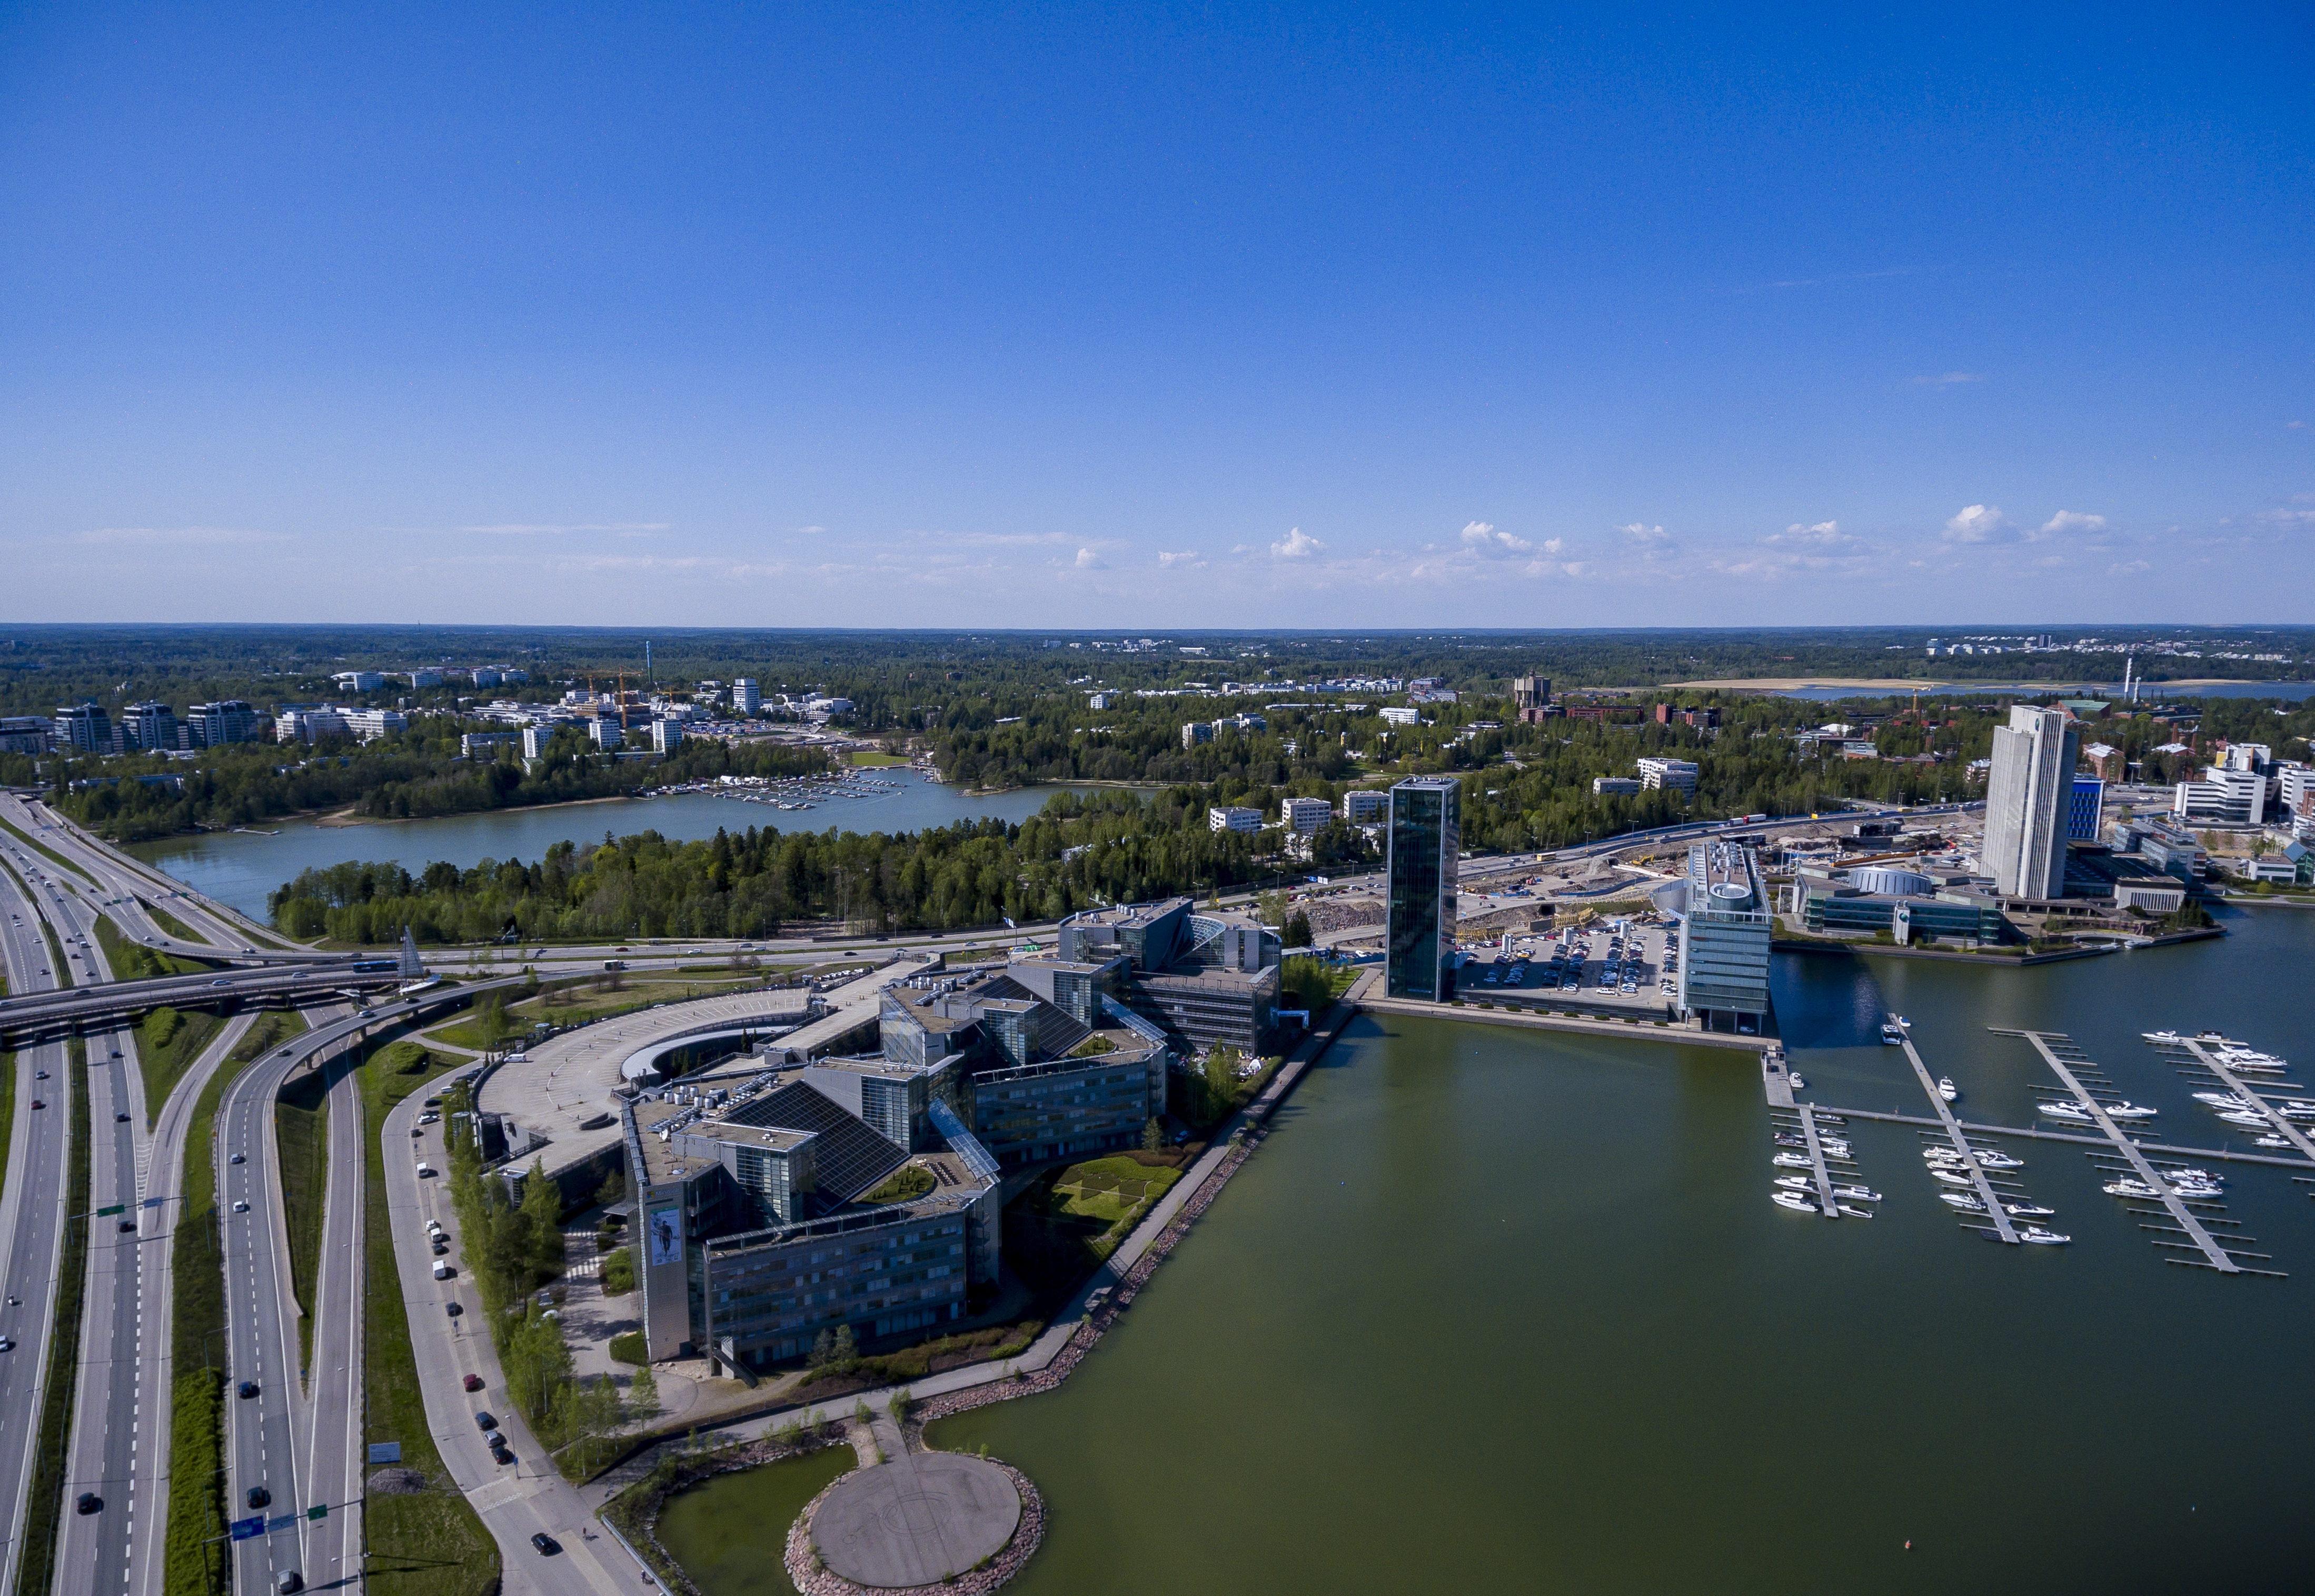 Espoo on monella tapaa koko Euroopan paras asuinkaupunki